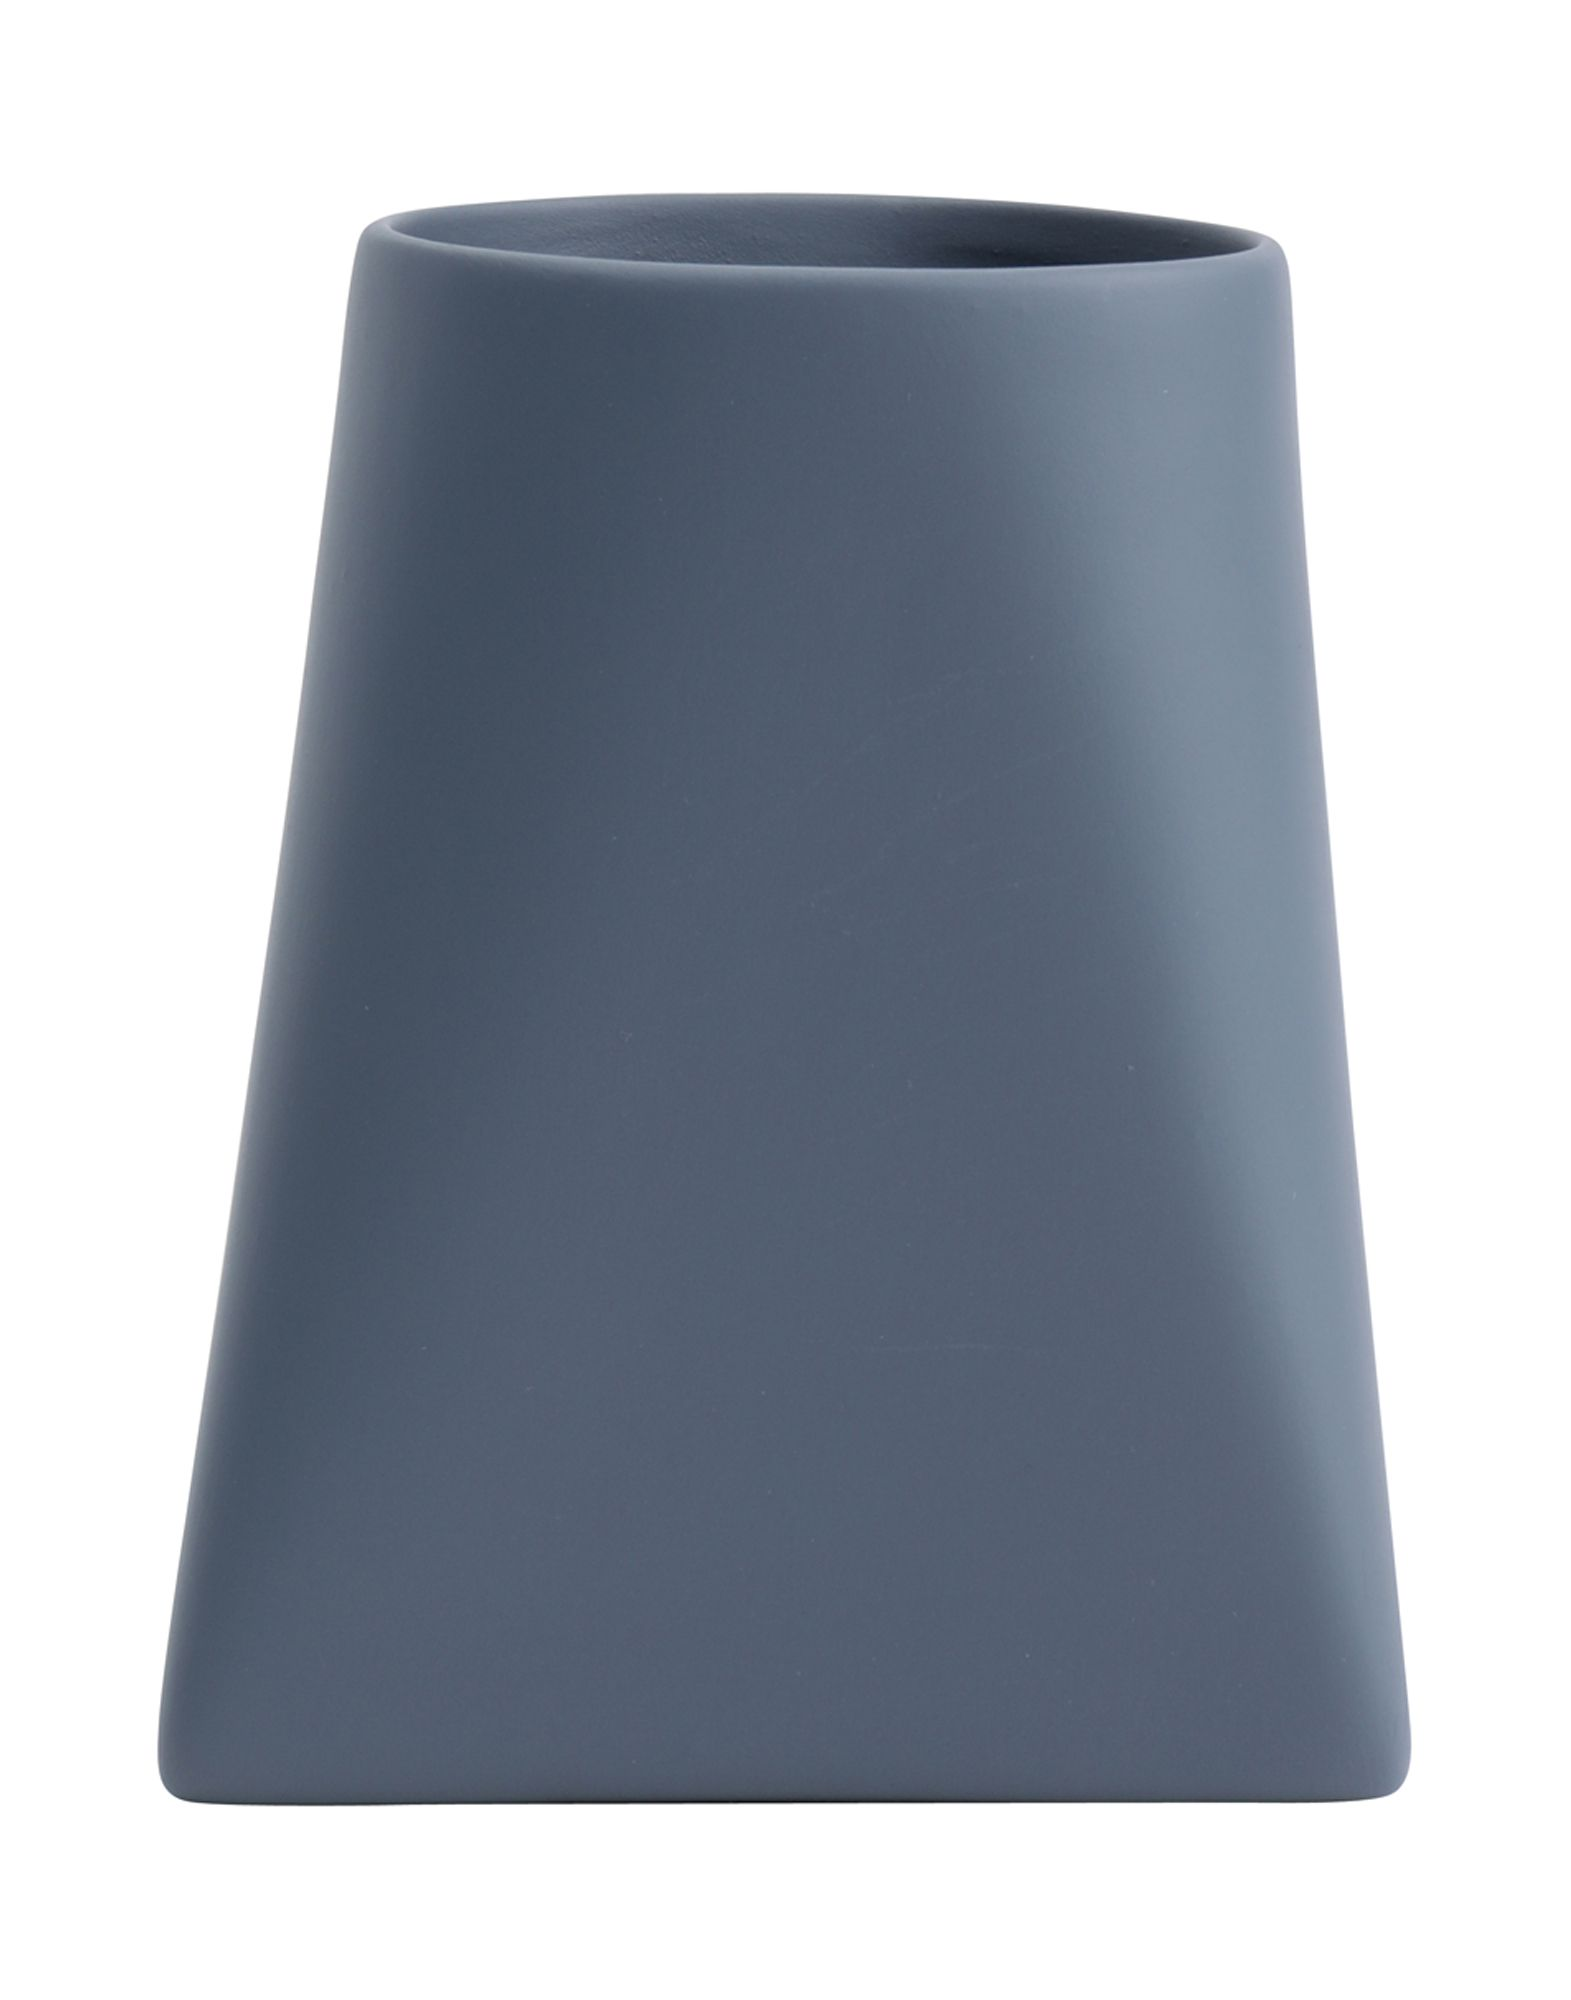 YOOX.COM(ユークス)《セール開催中》CEDIT Unisex ベース ブルー 陶製 lapis